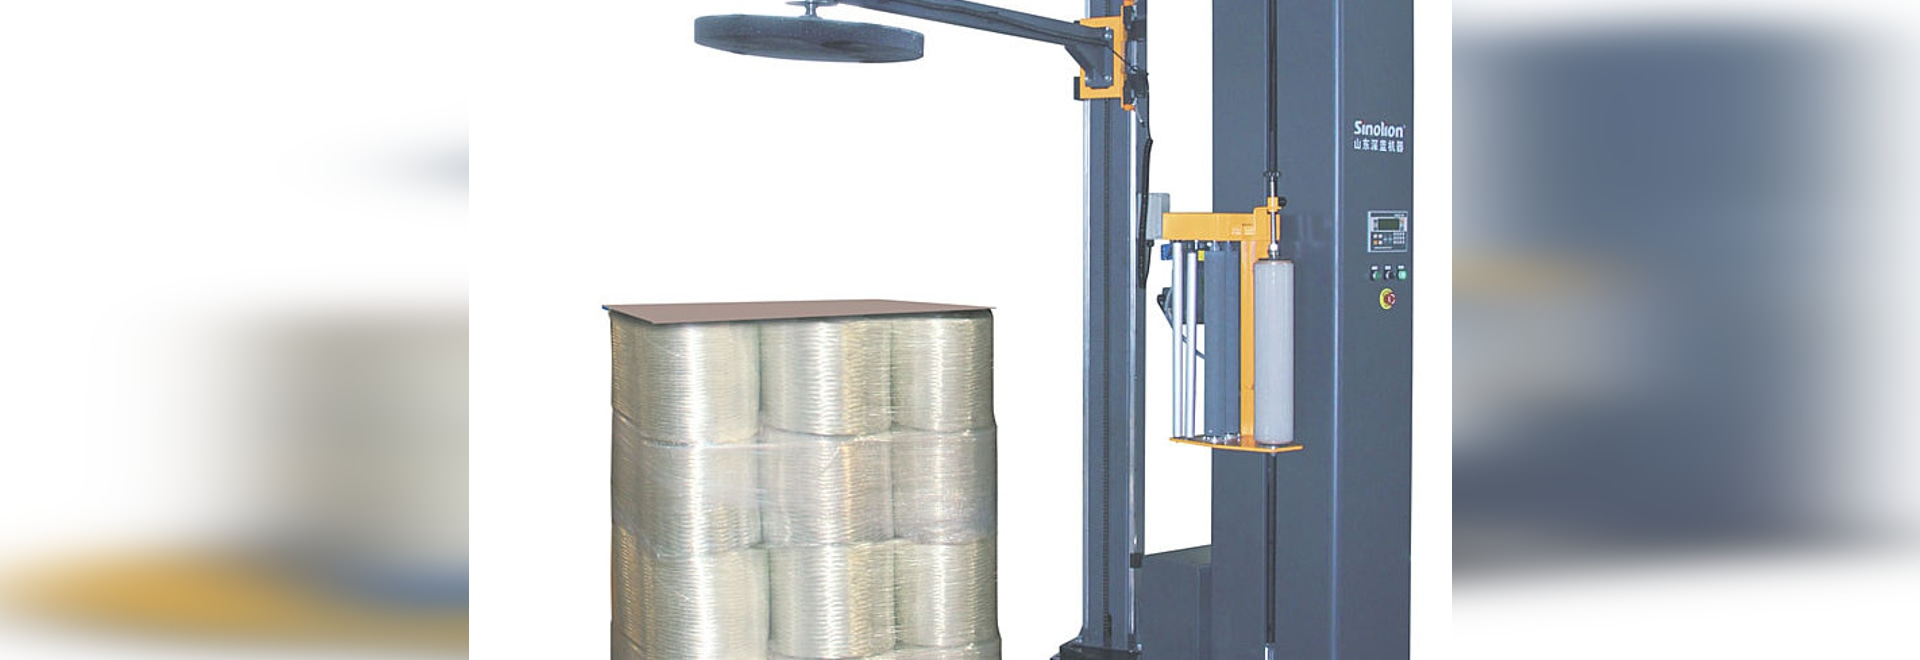 T1650F-CS Spitzenvorlagenglas-Ladeplattenverpackung - SHANDONG ...